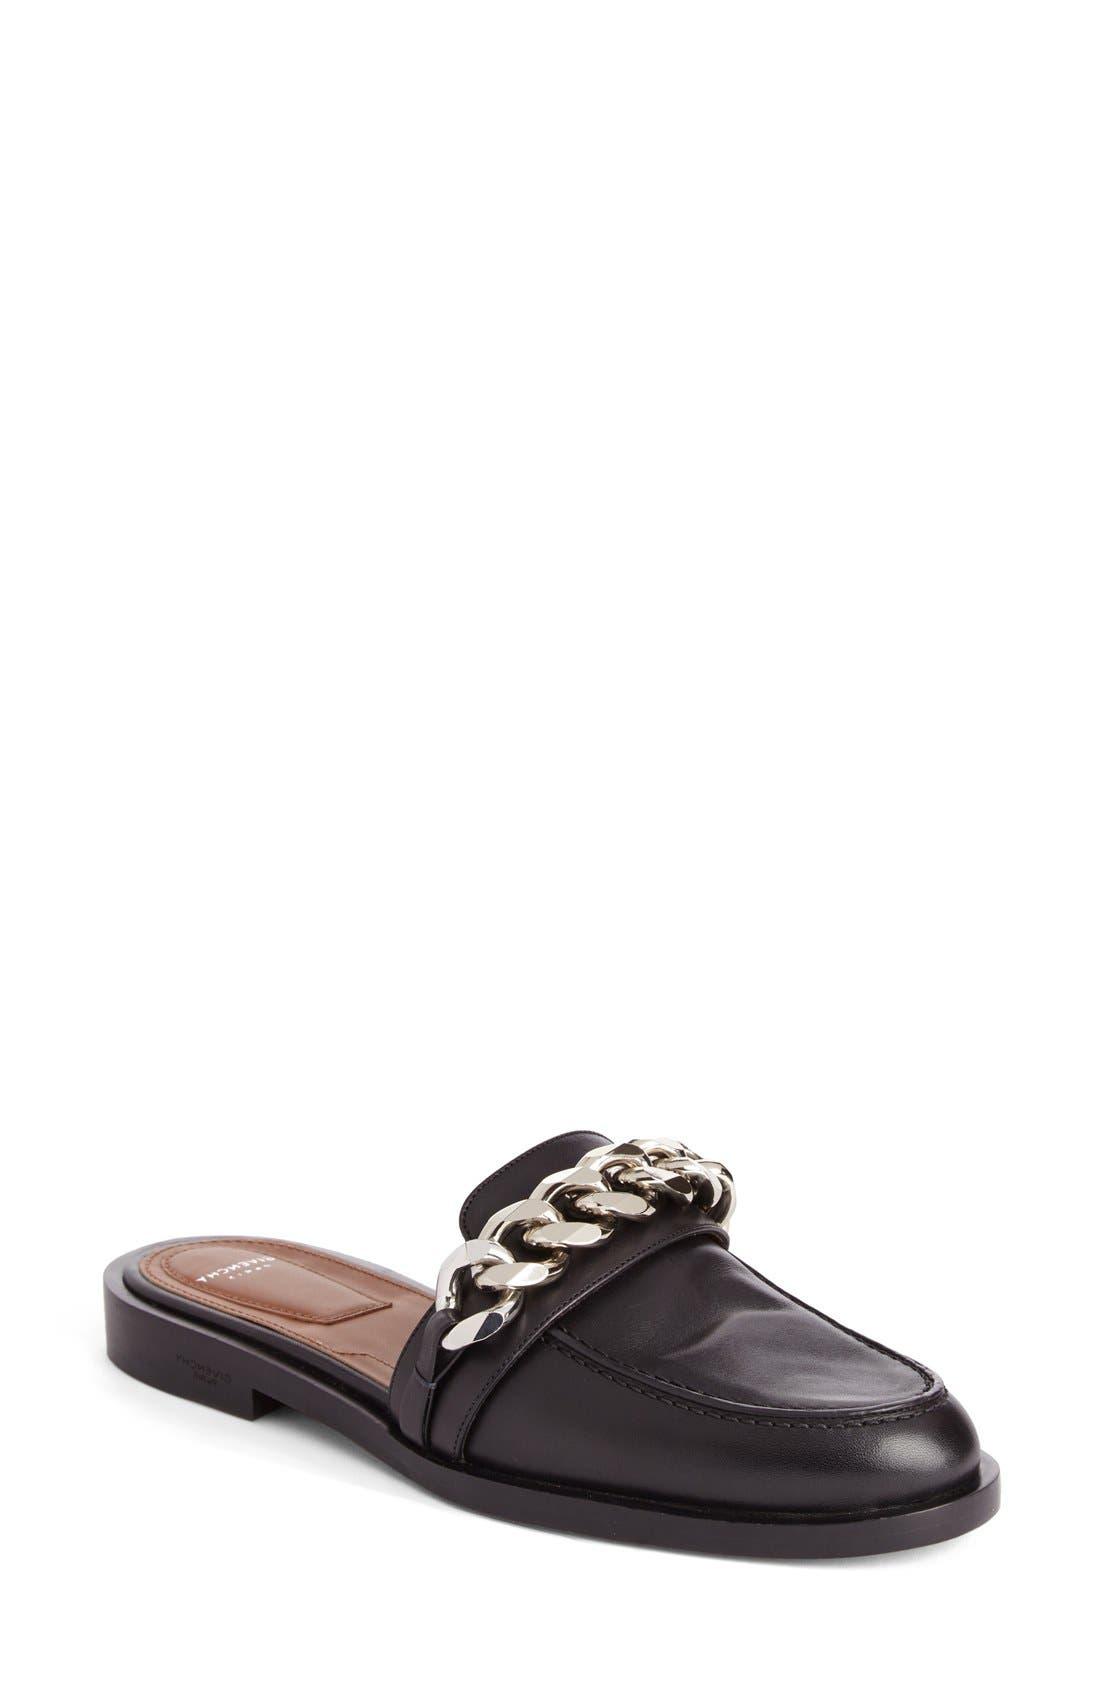 Chain Strap Loafer Mule,                             Main thumbnail 1, color,                             Black